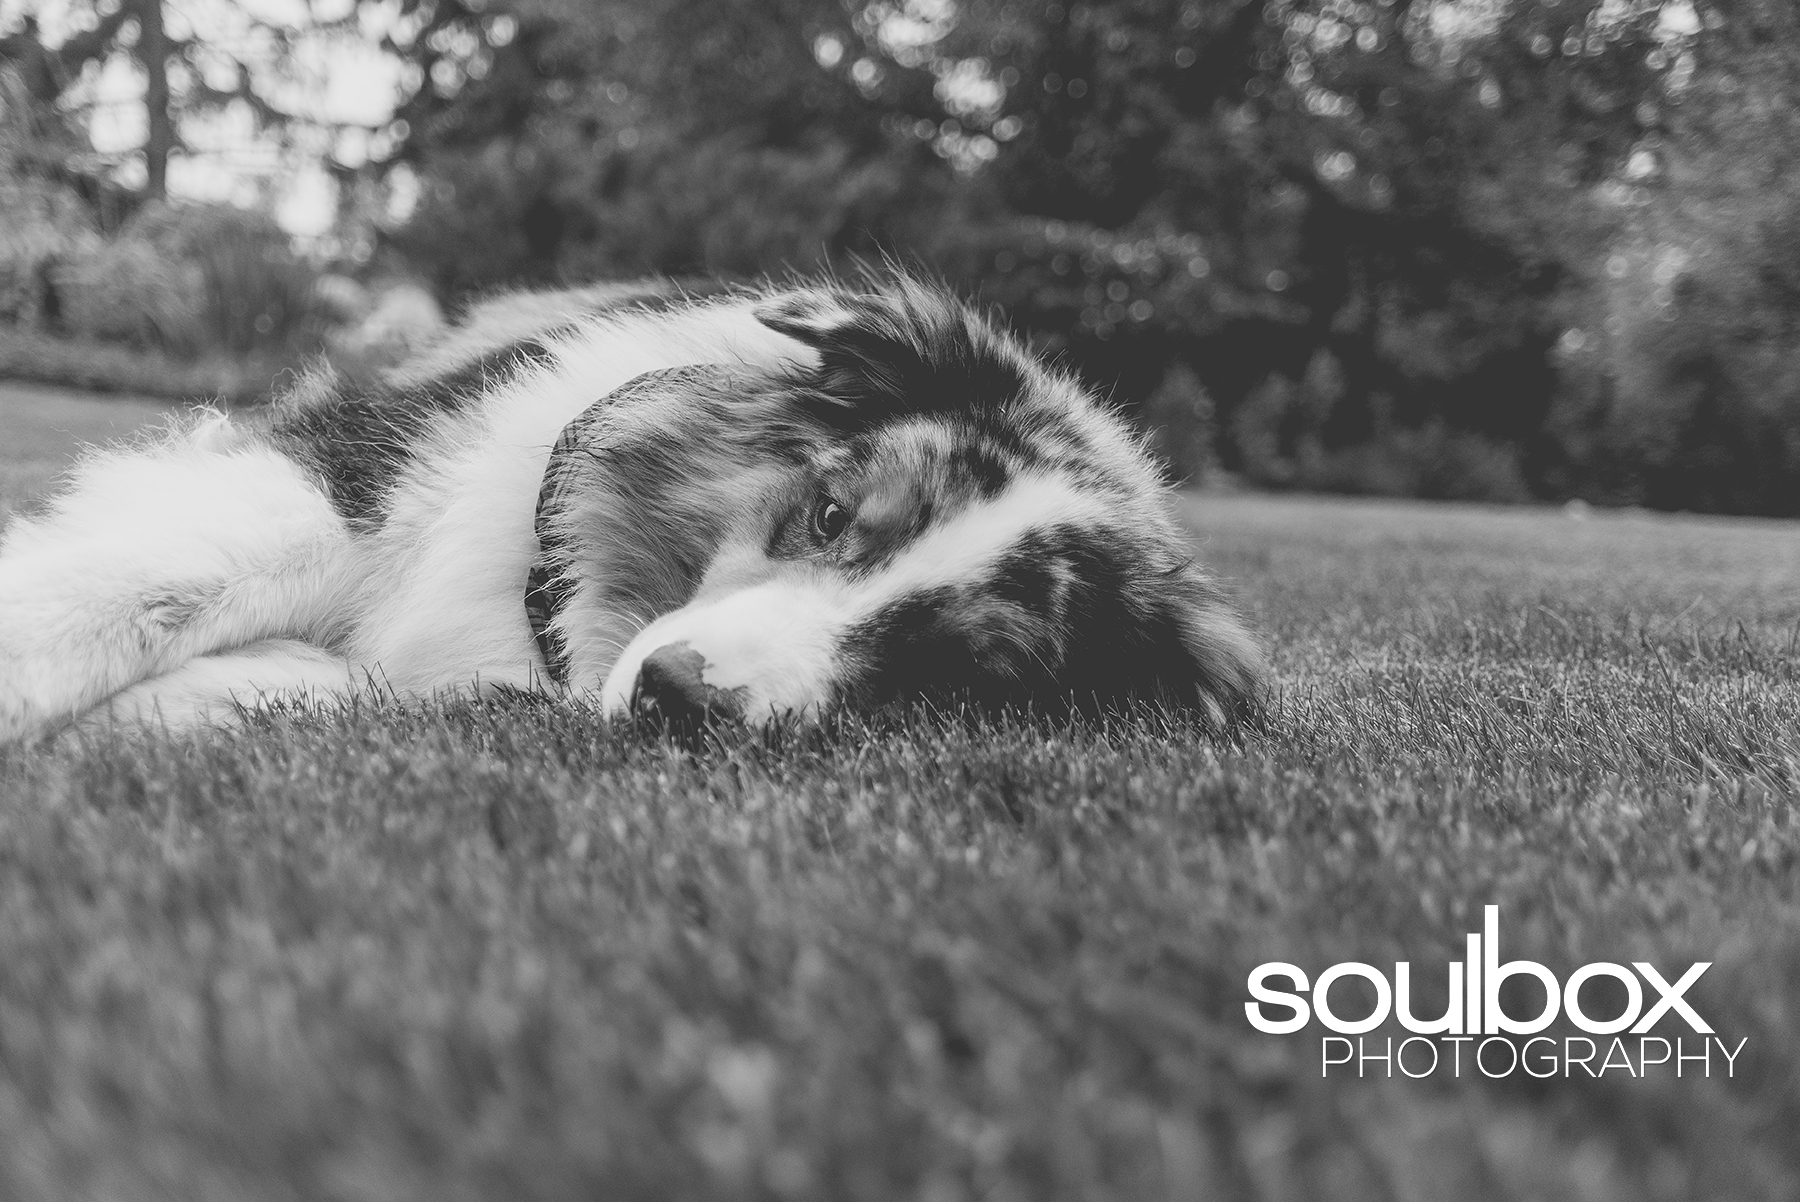 SoulboxPhotographyPetPhotography-2.jpg